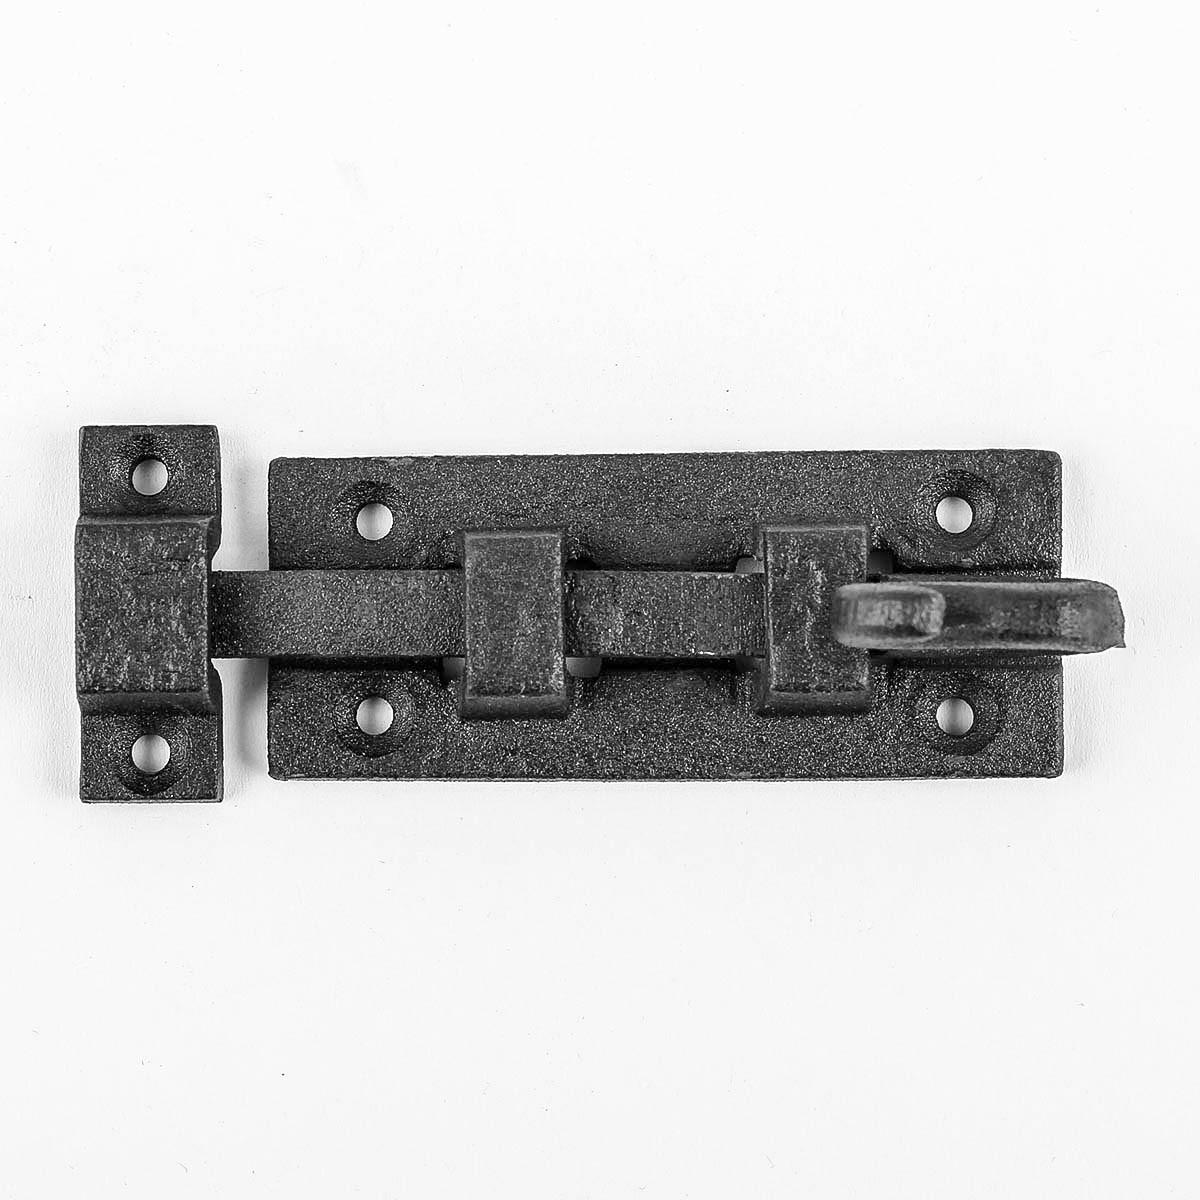 Black Wrought Iron Cabinet or Door Fancy Slide Bolt 3 78 Black Slide Bolt Slide Lock For Door Wrought Iron Slide Latch Lock